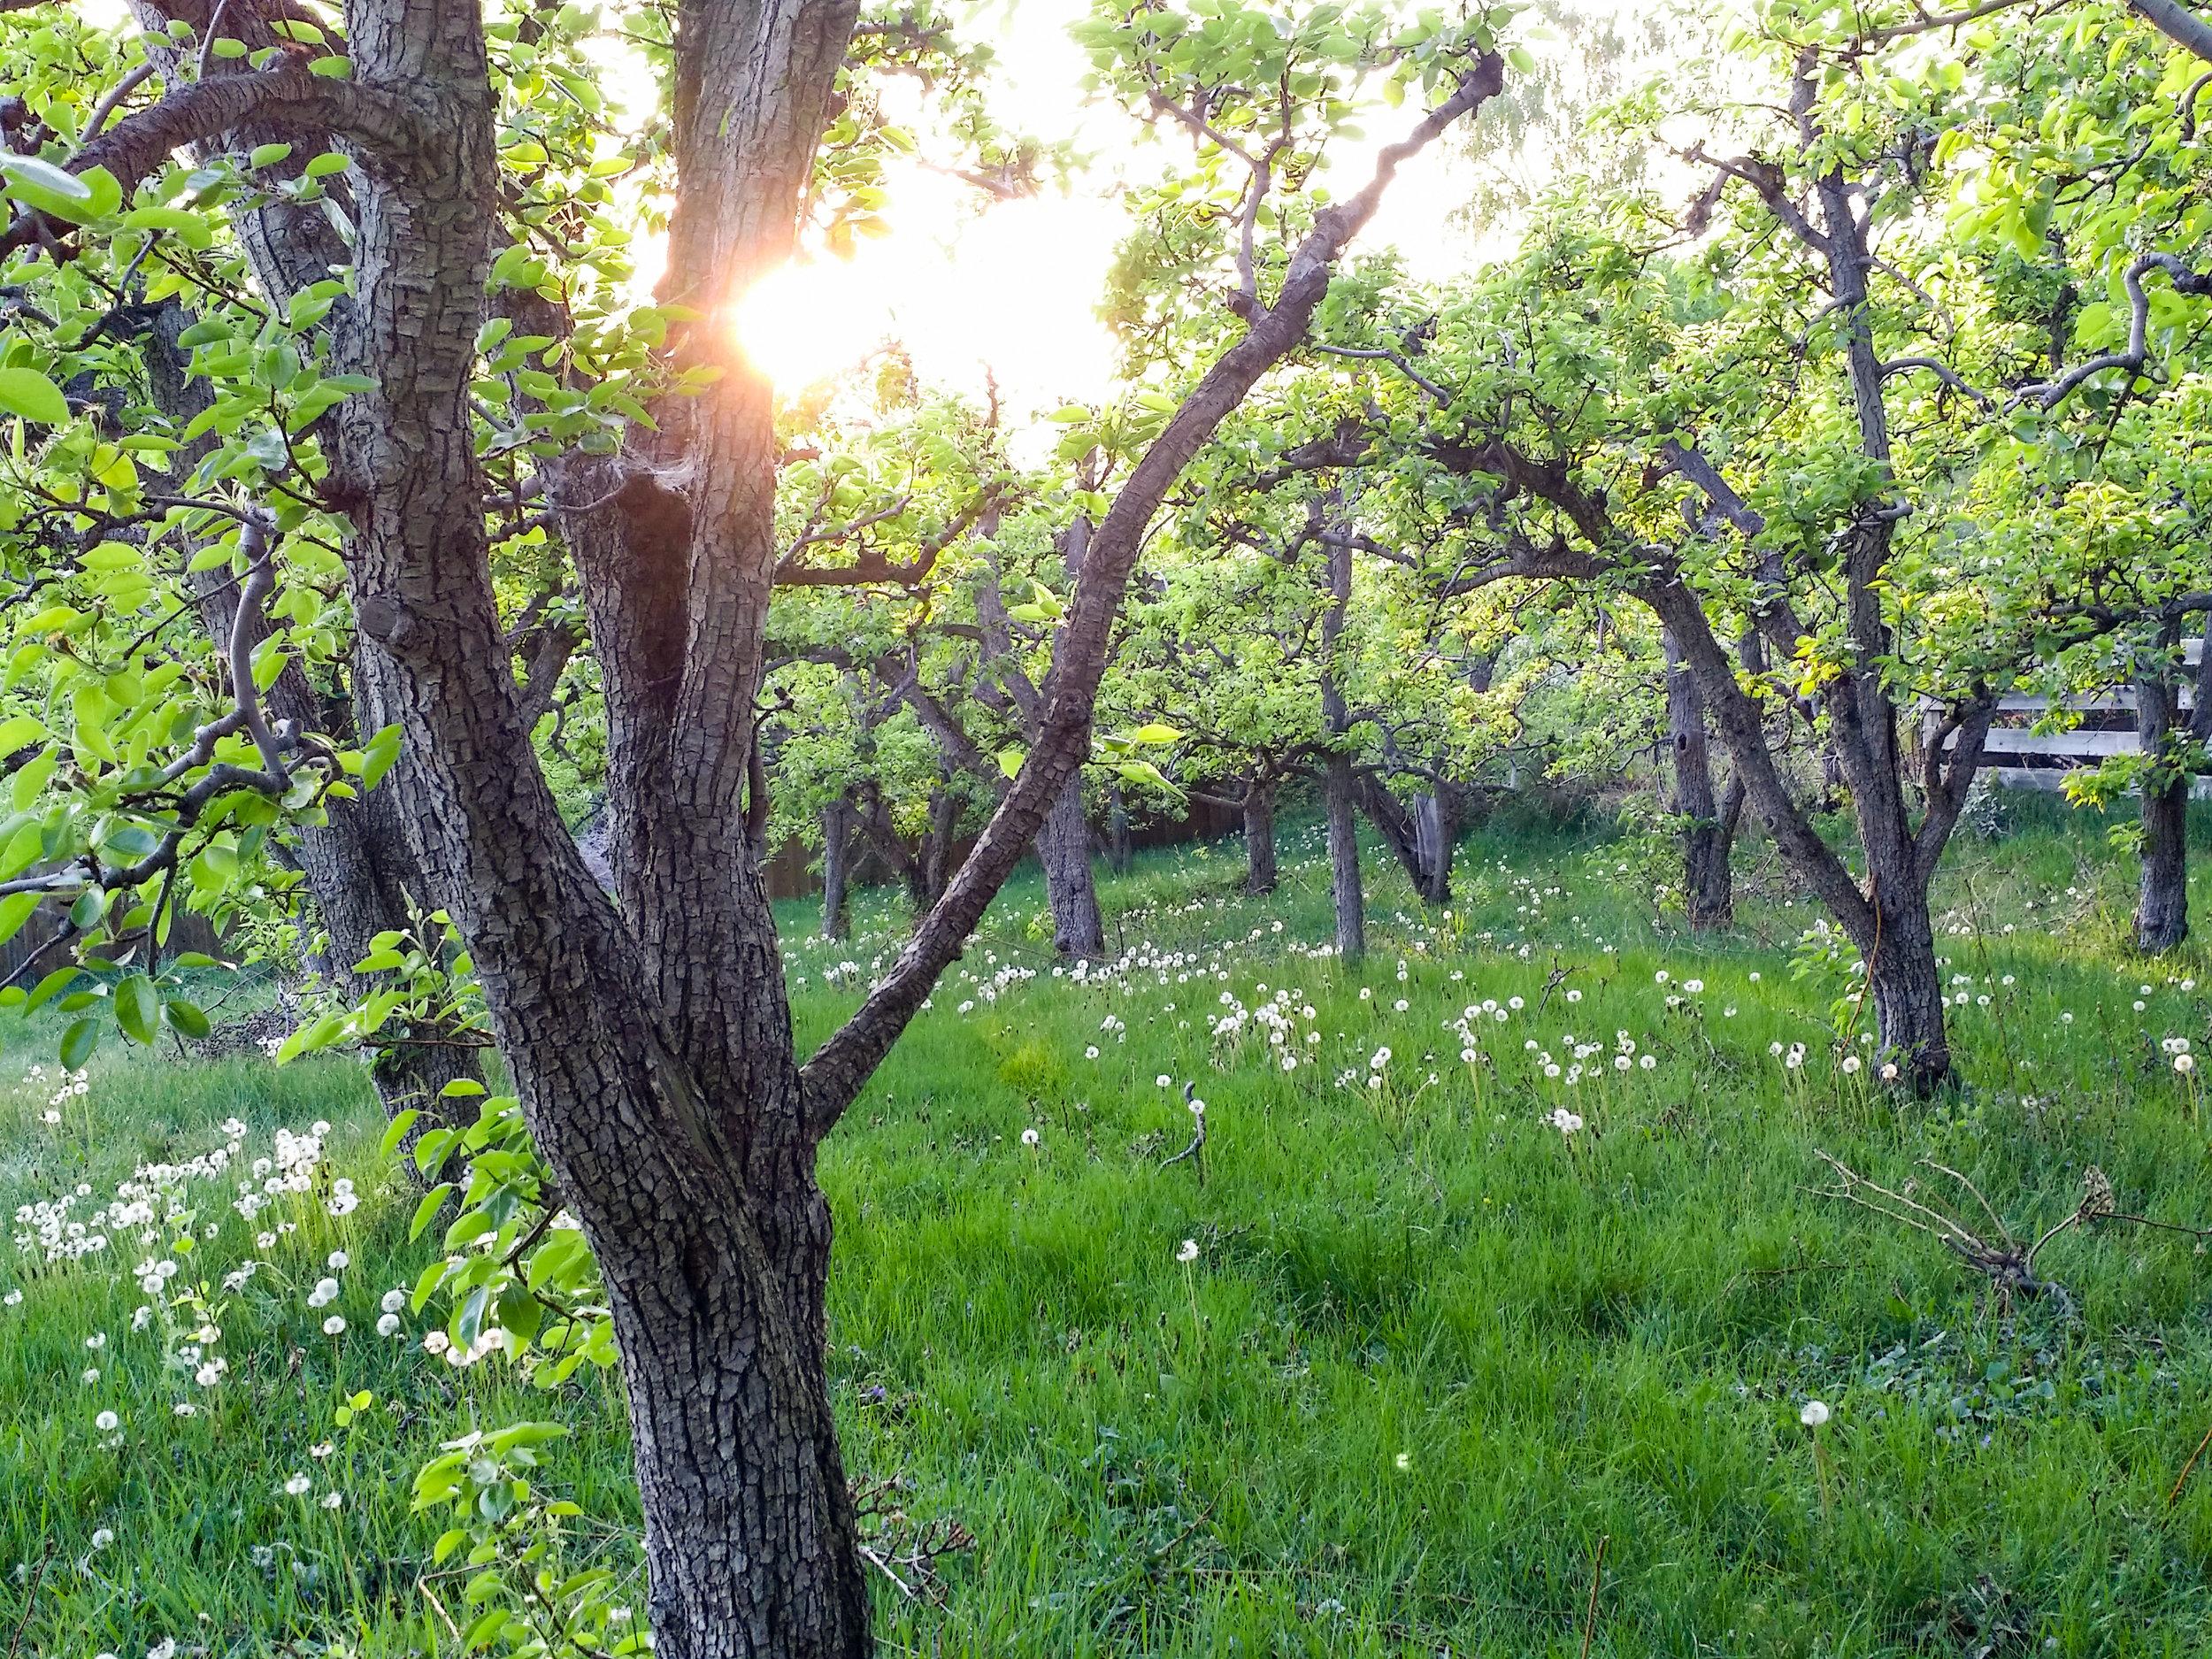 Kevin Van Reenen - orchard2 - Edited.jpg